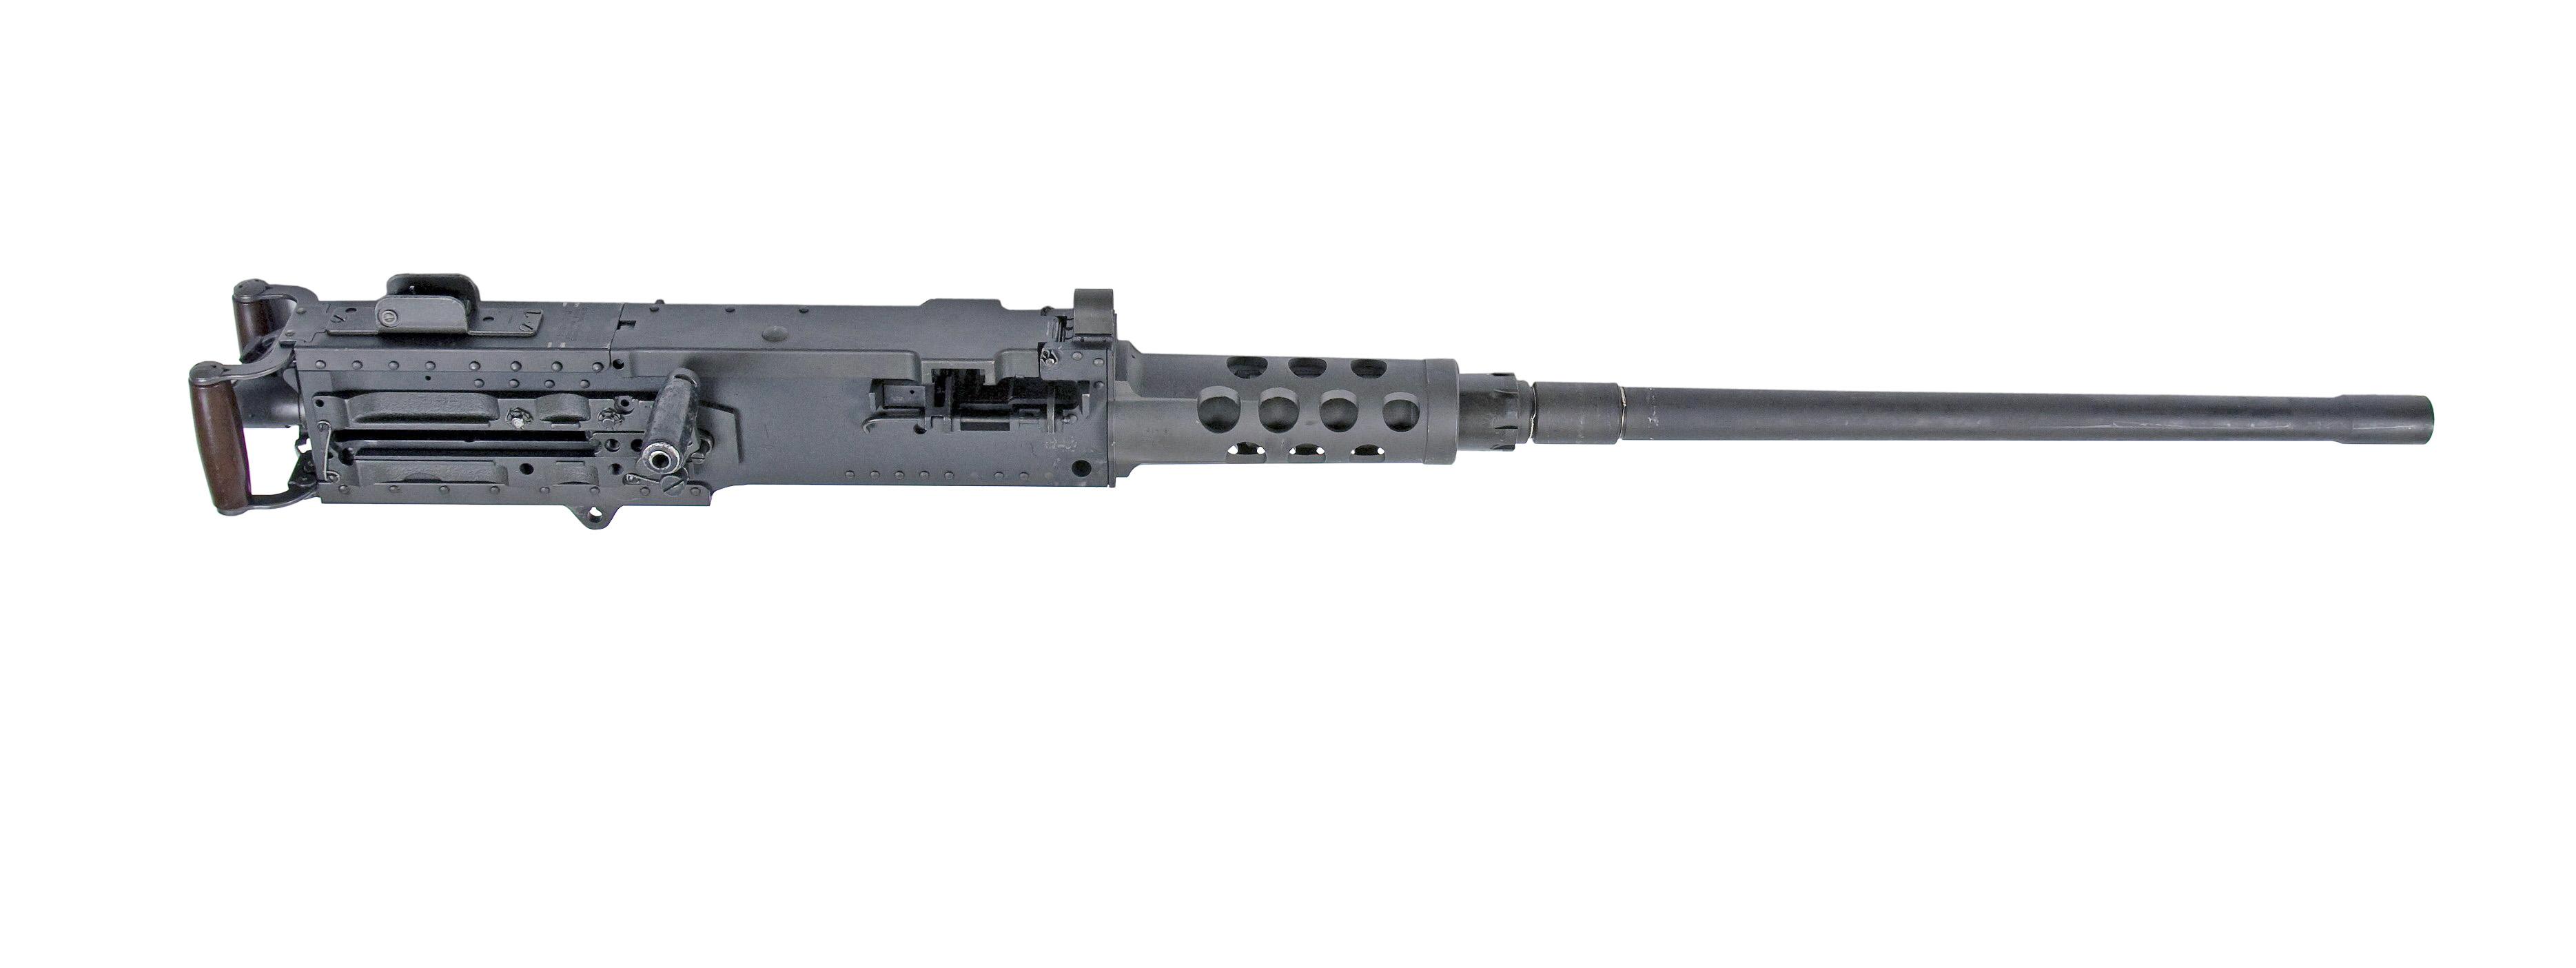 m5 machine gun - photo #28